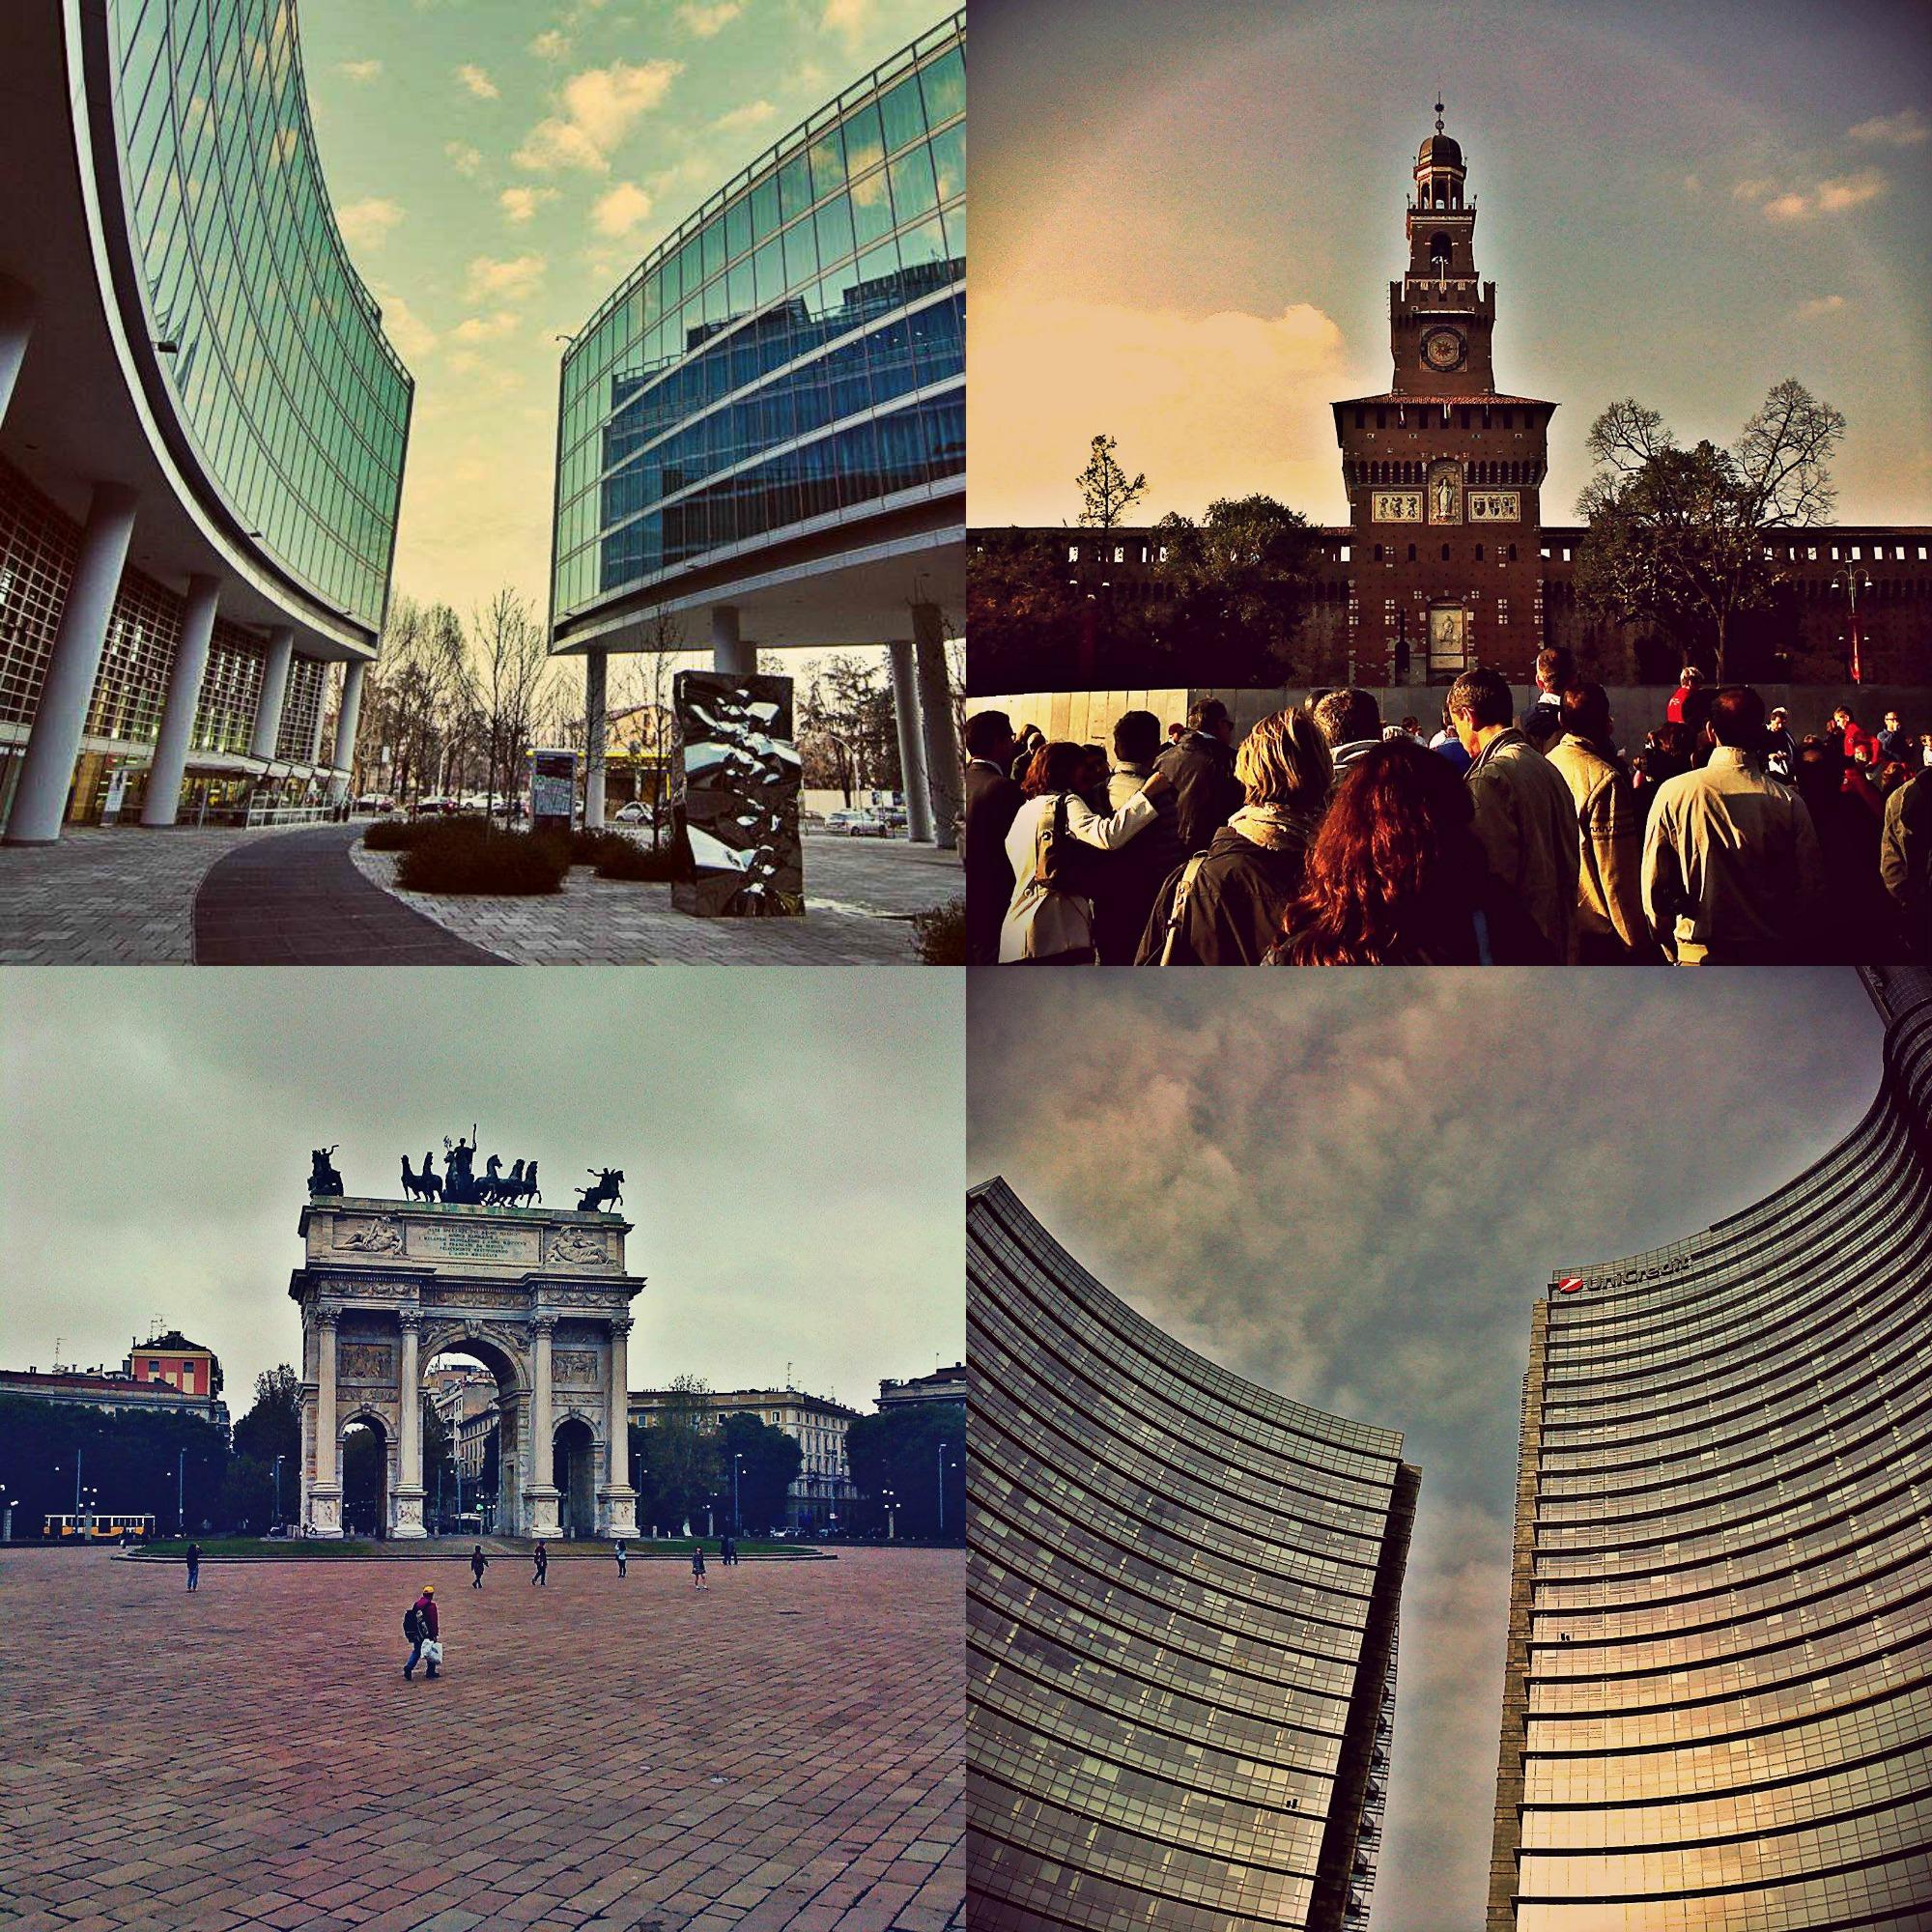 PicMonkey Collage bhhujbbn